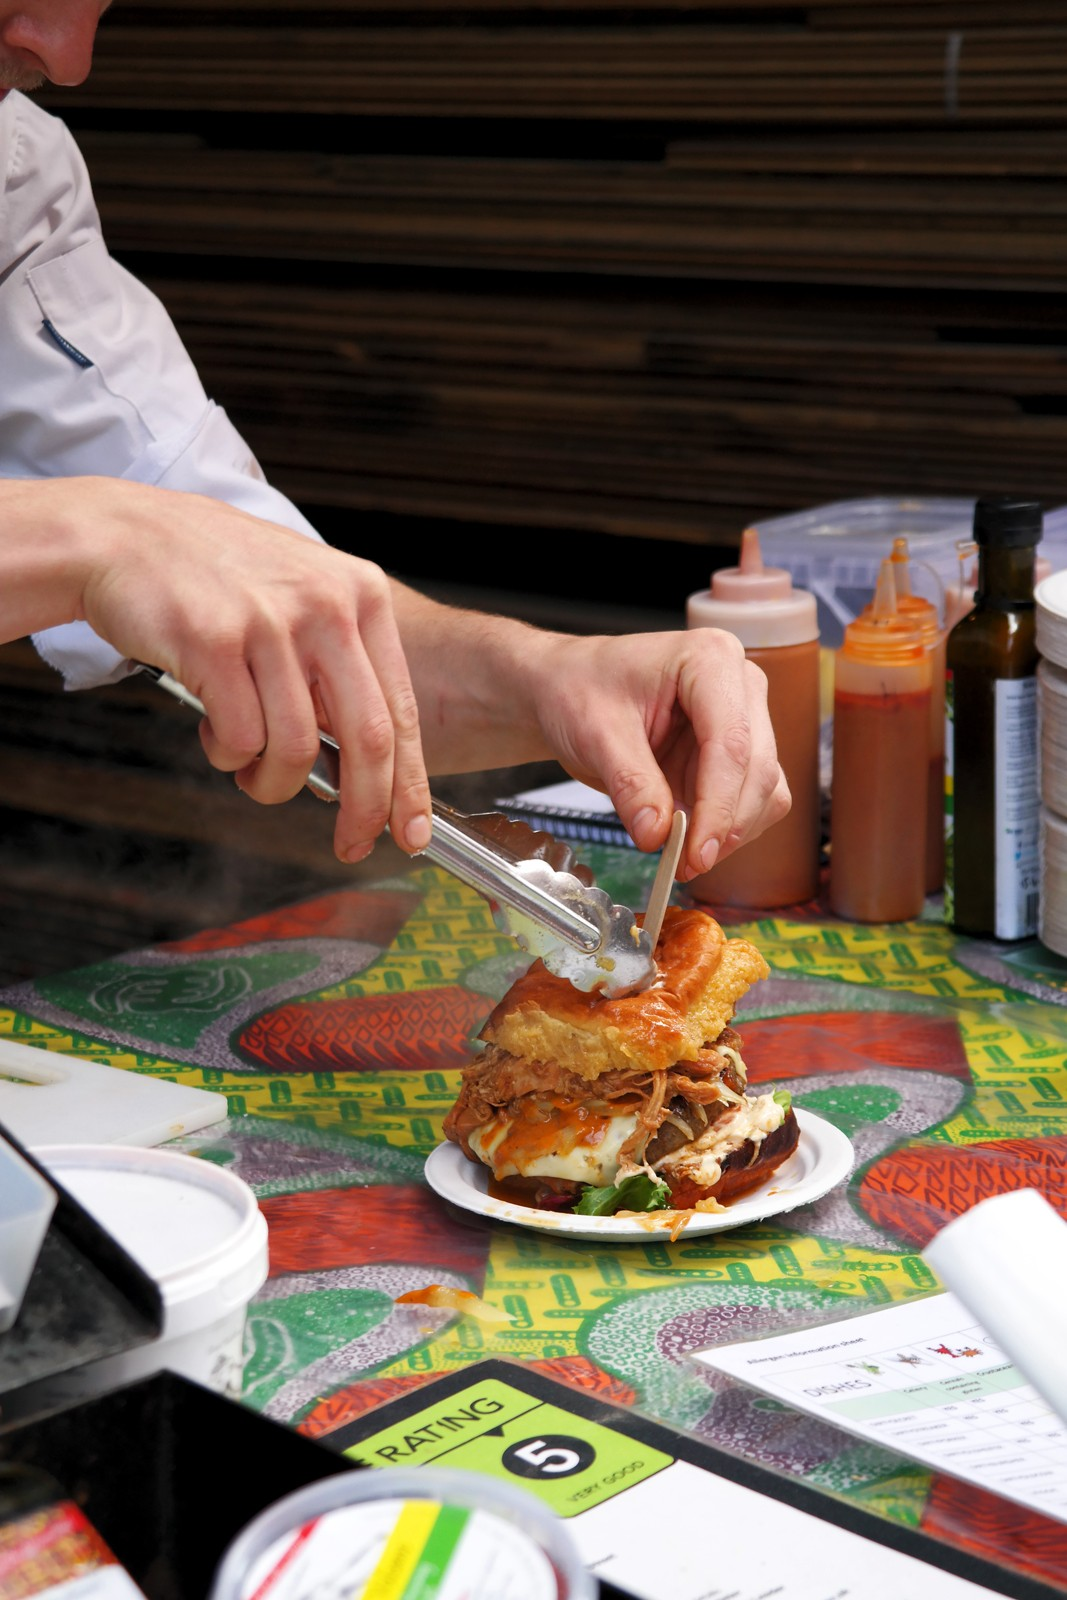 African Volcano burger recipe beef tomato ketchup emmenthaler cheese peri peri sauce Maltby Street Market Ropewalk London Bermondsey marché gourmand Londres by usofparis blog